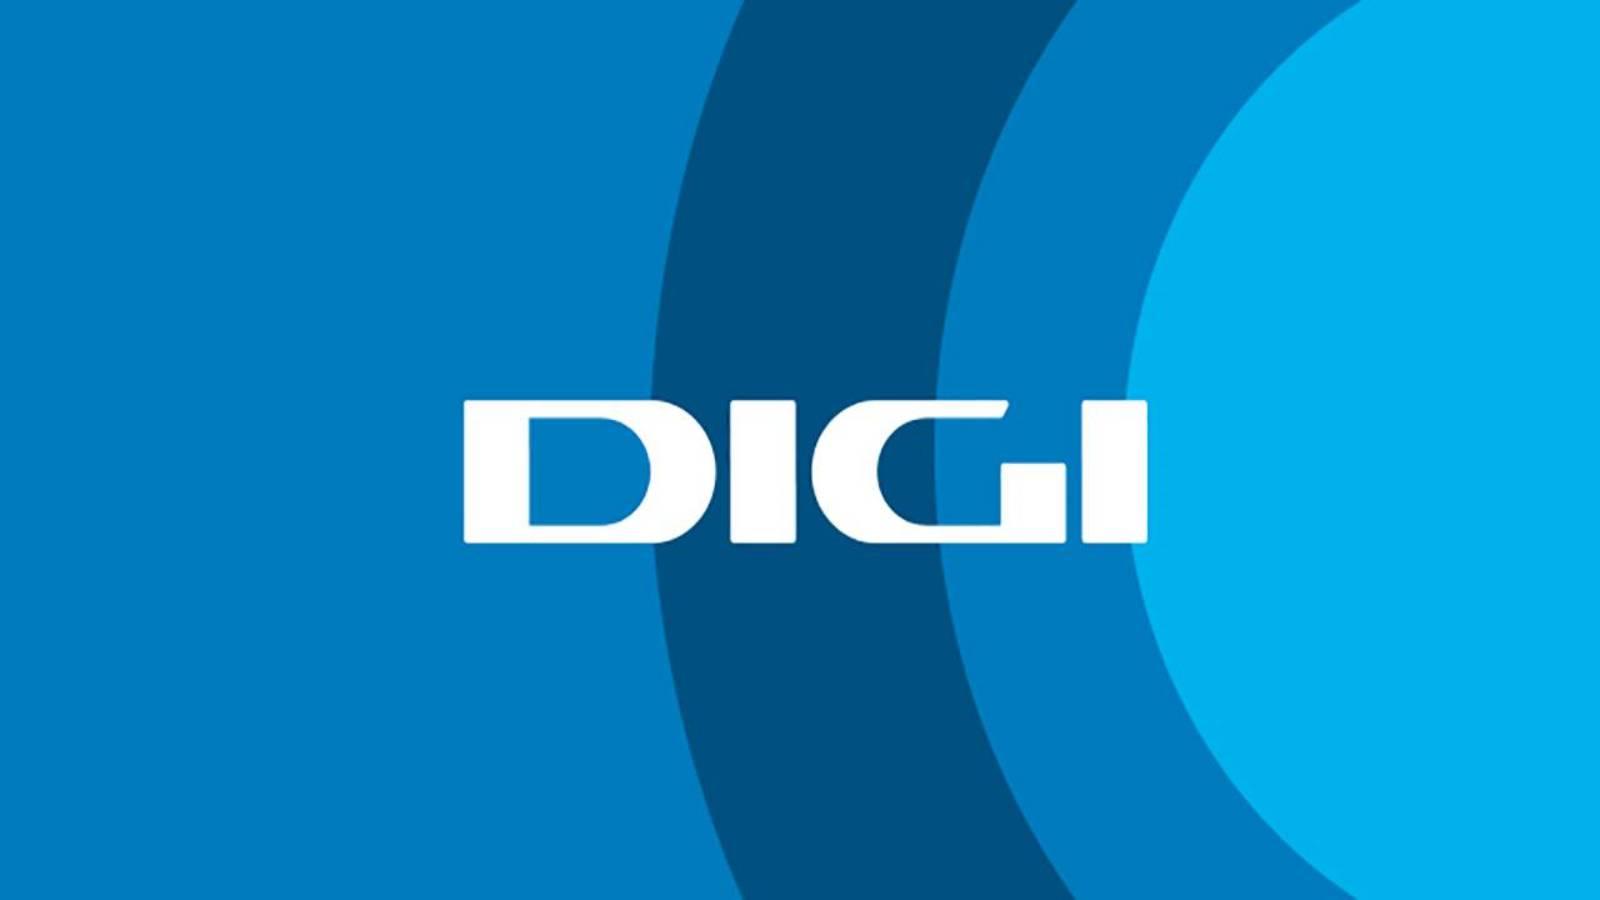 DIGI Romania streaming